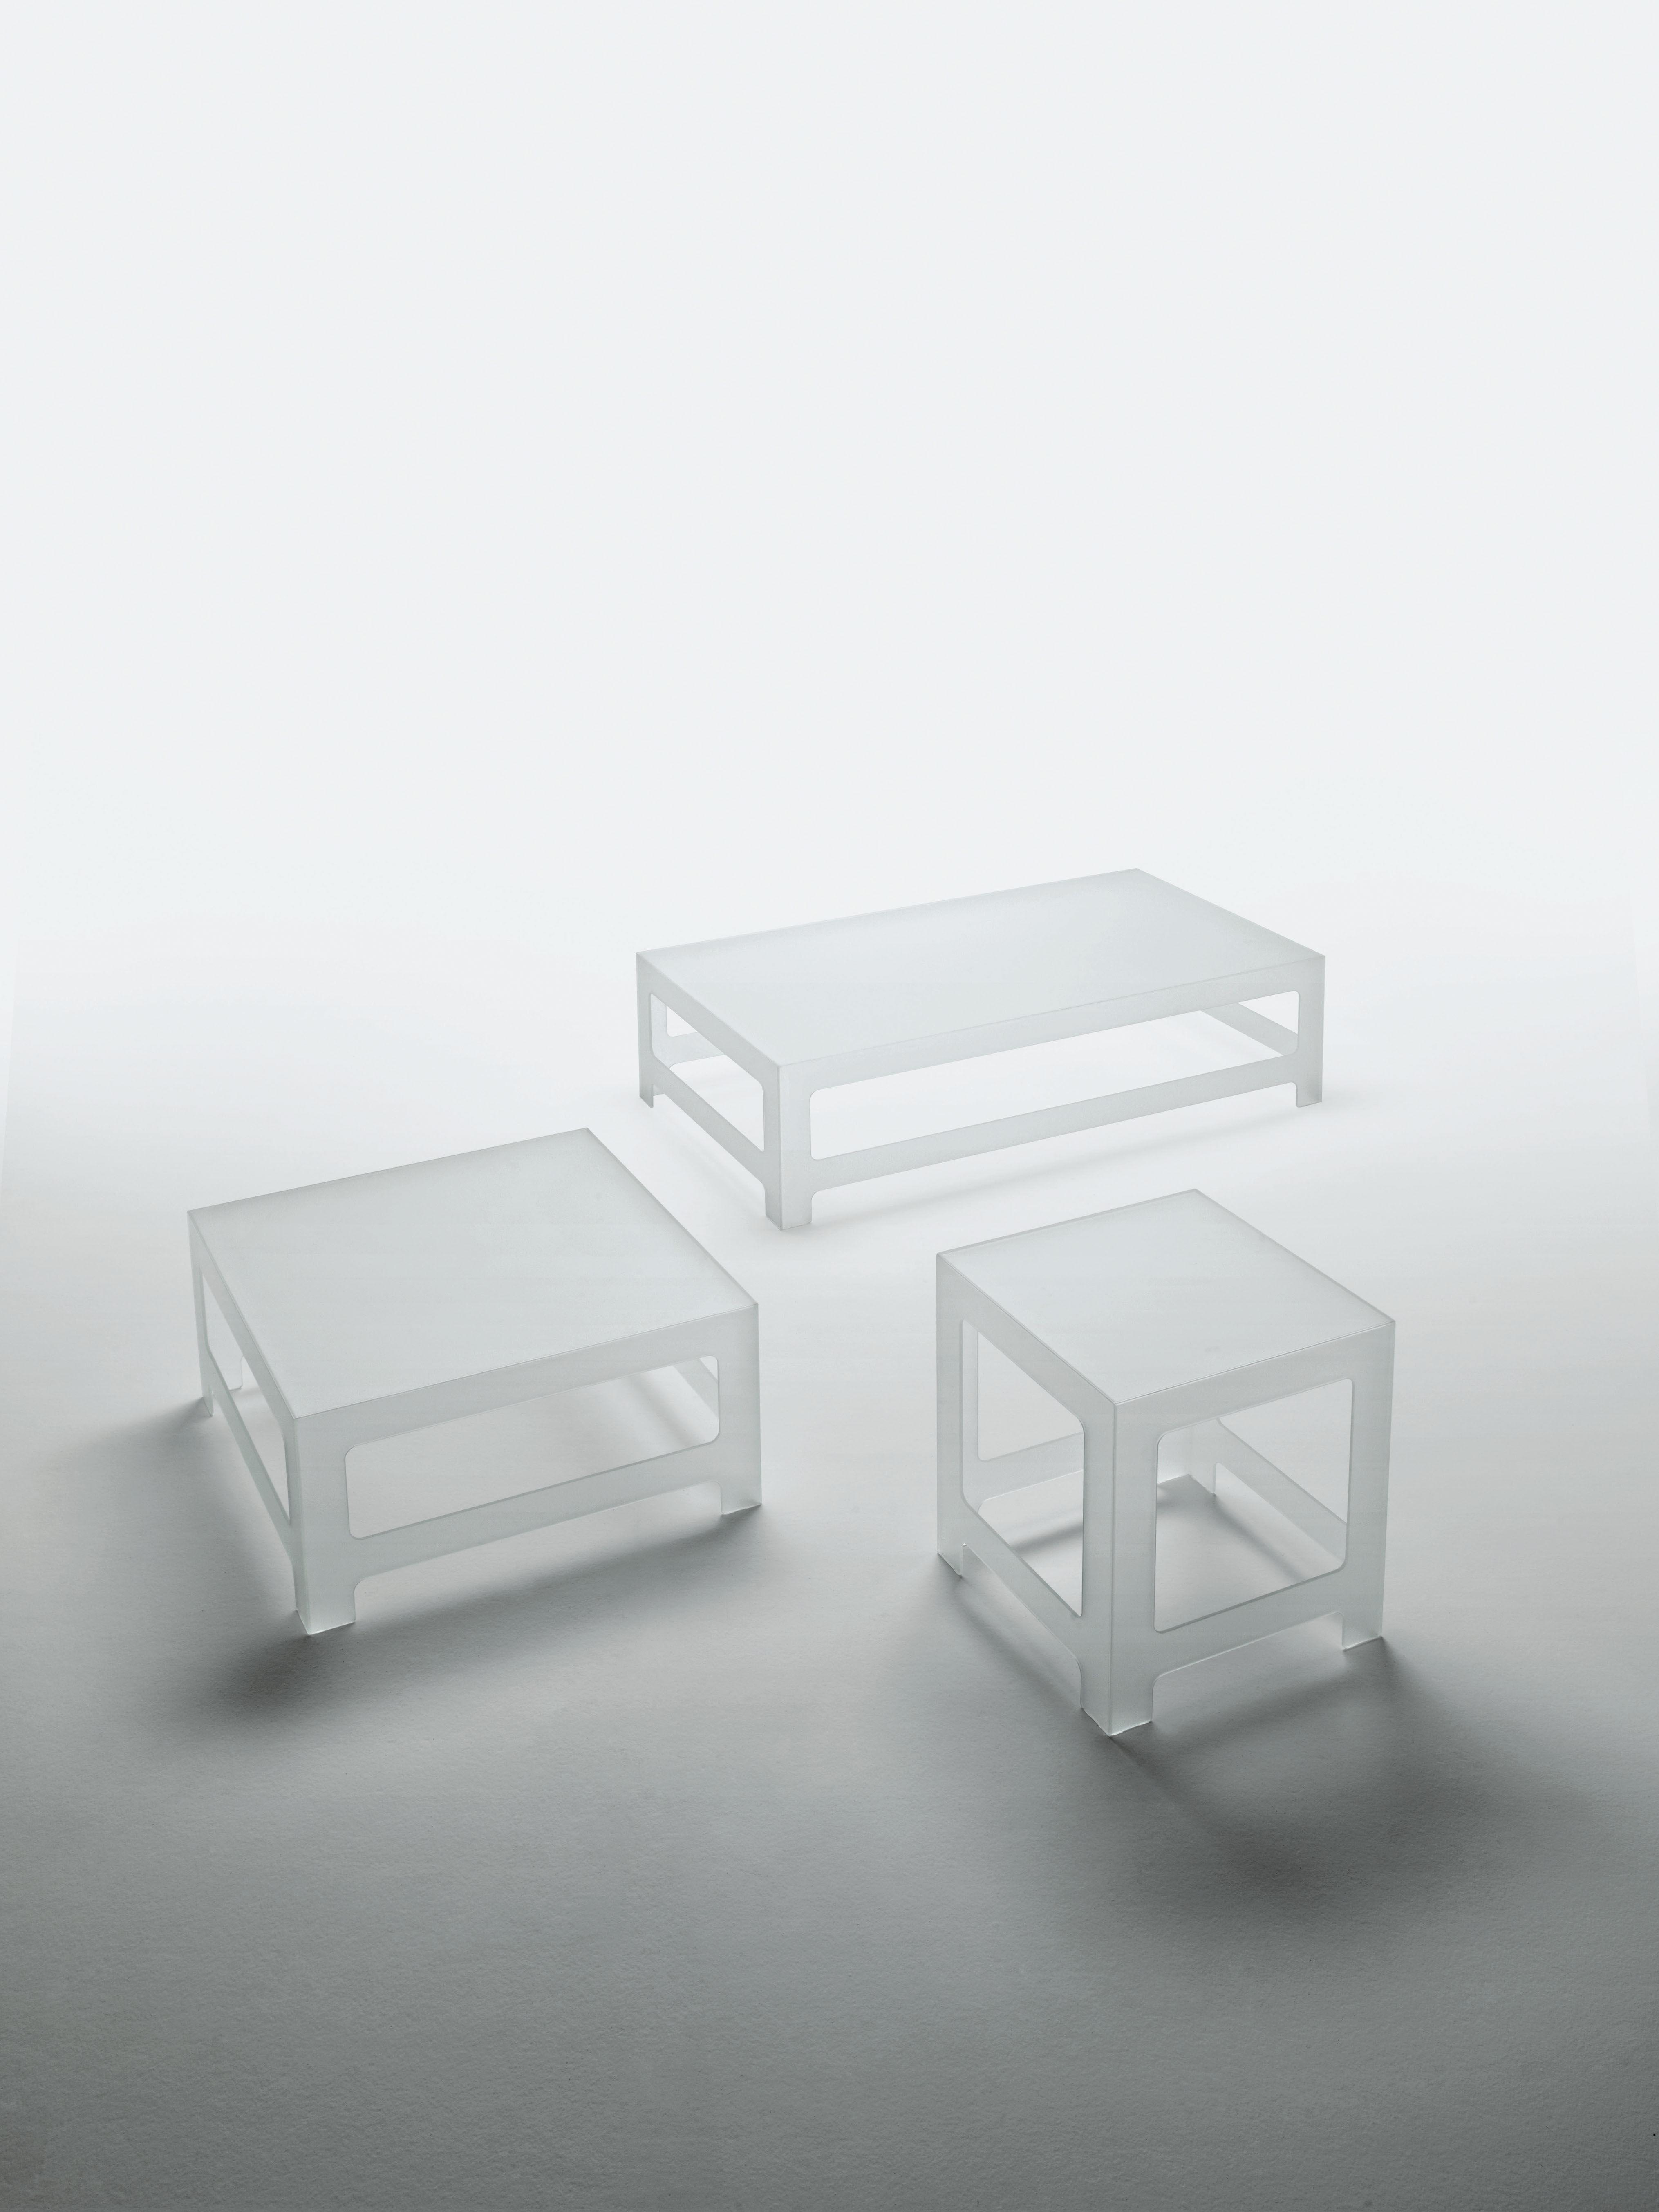 Nezu coffee table h 30 cm 130 x 70 cm 130 x 70 cm for Coffee table 70 x 70